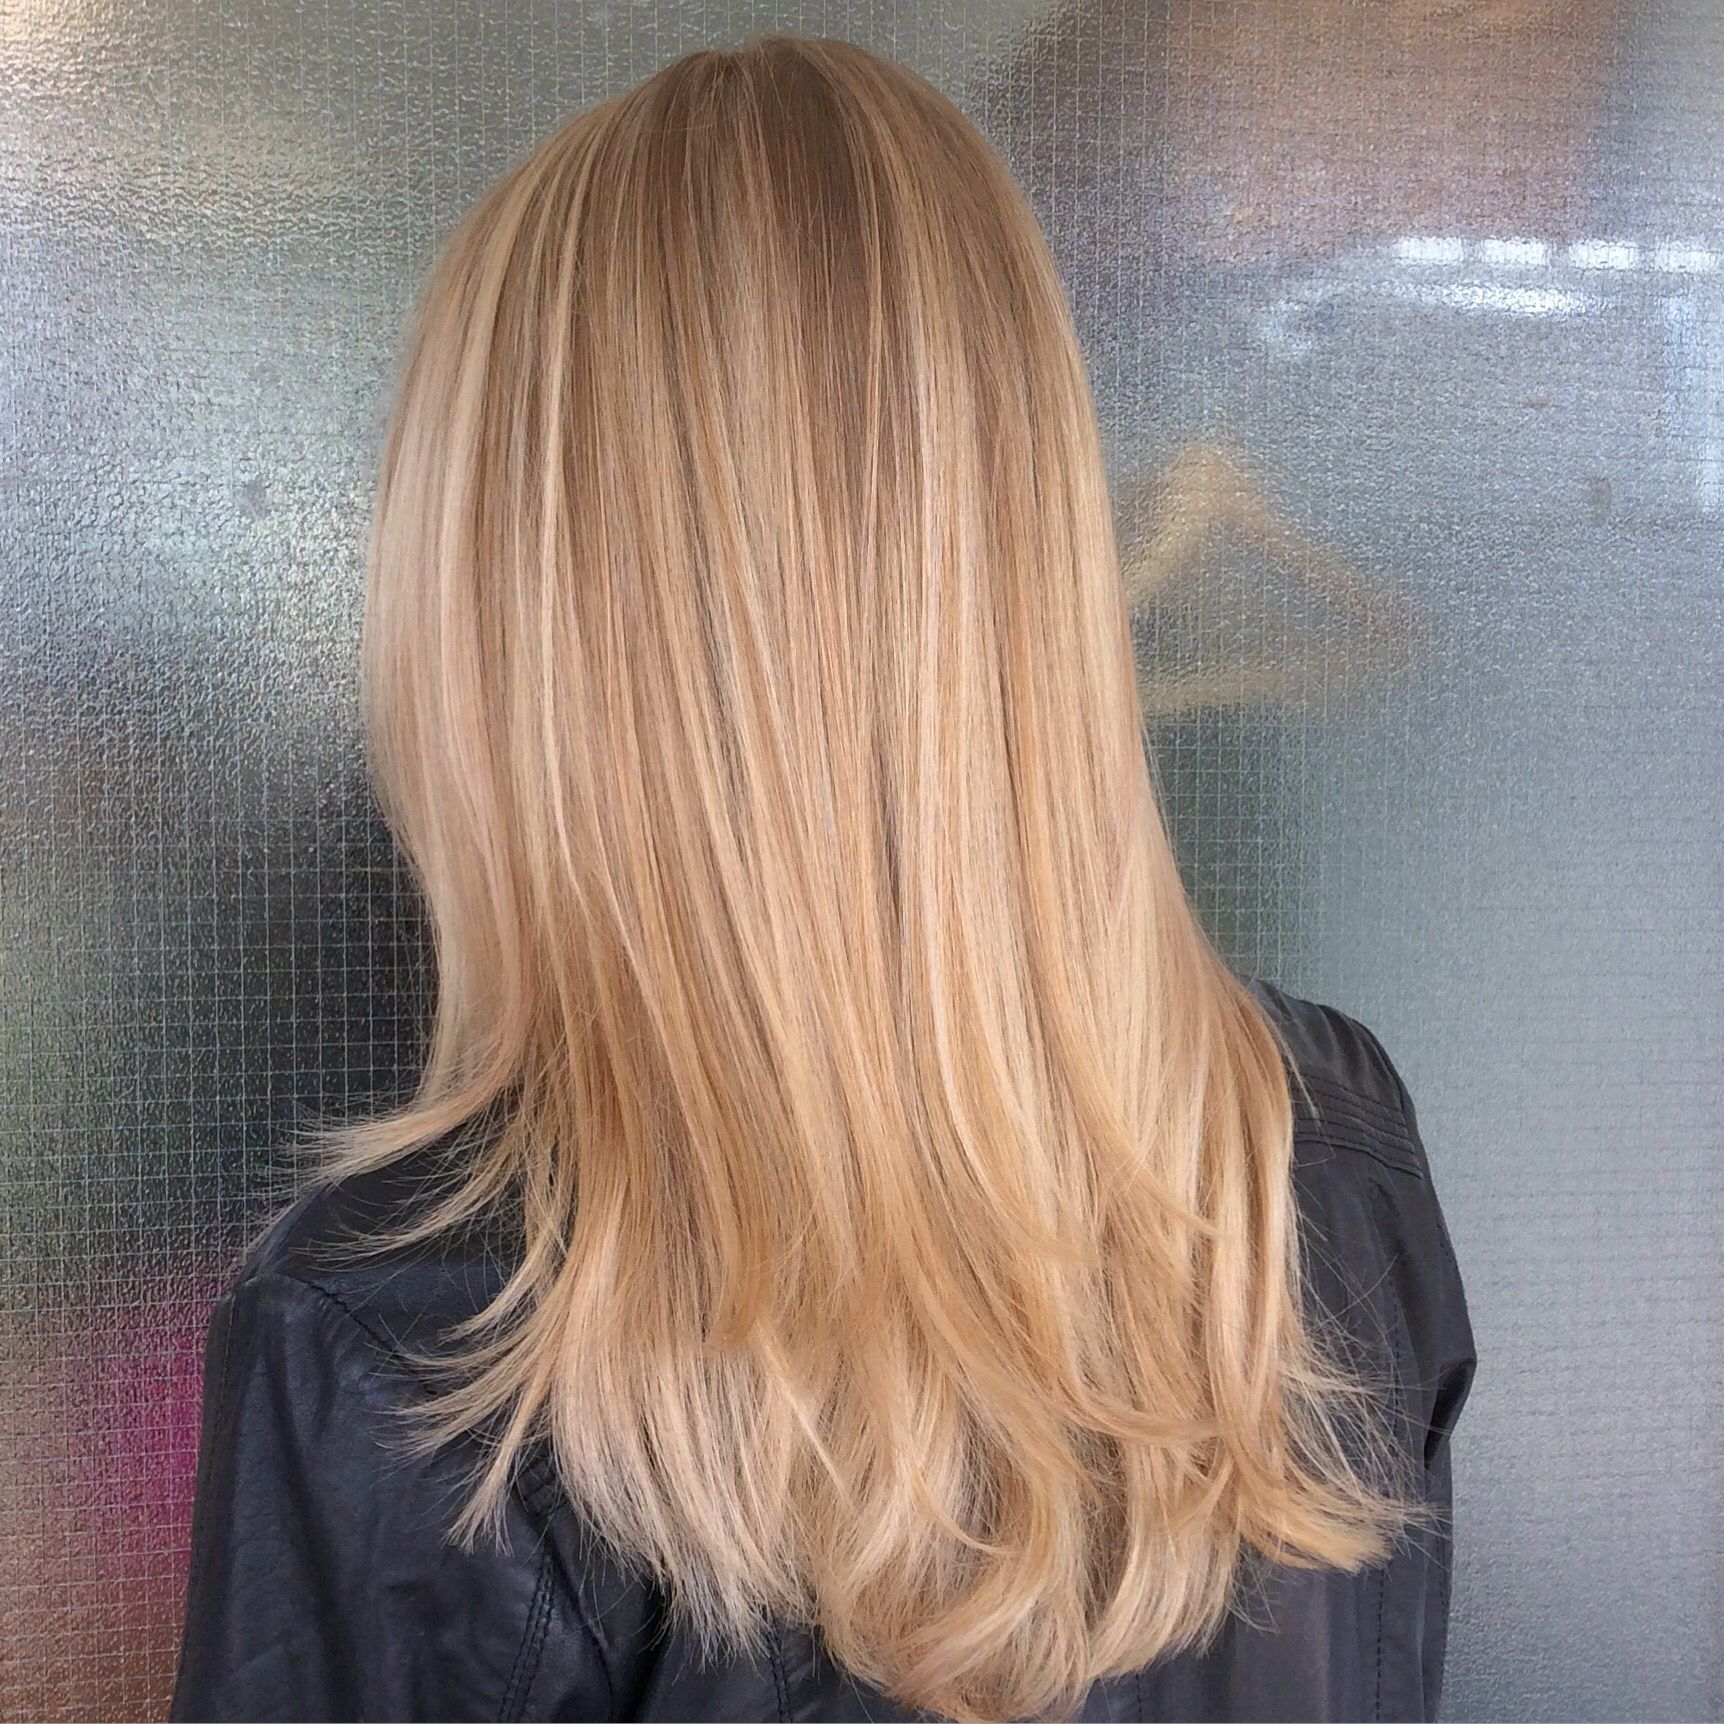 Goldblond long hair with balayage highlights ...